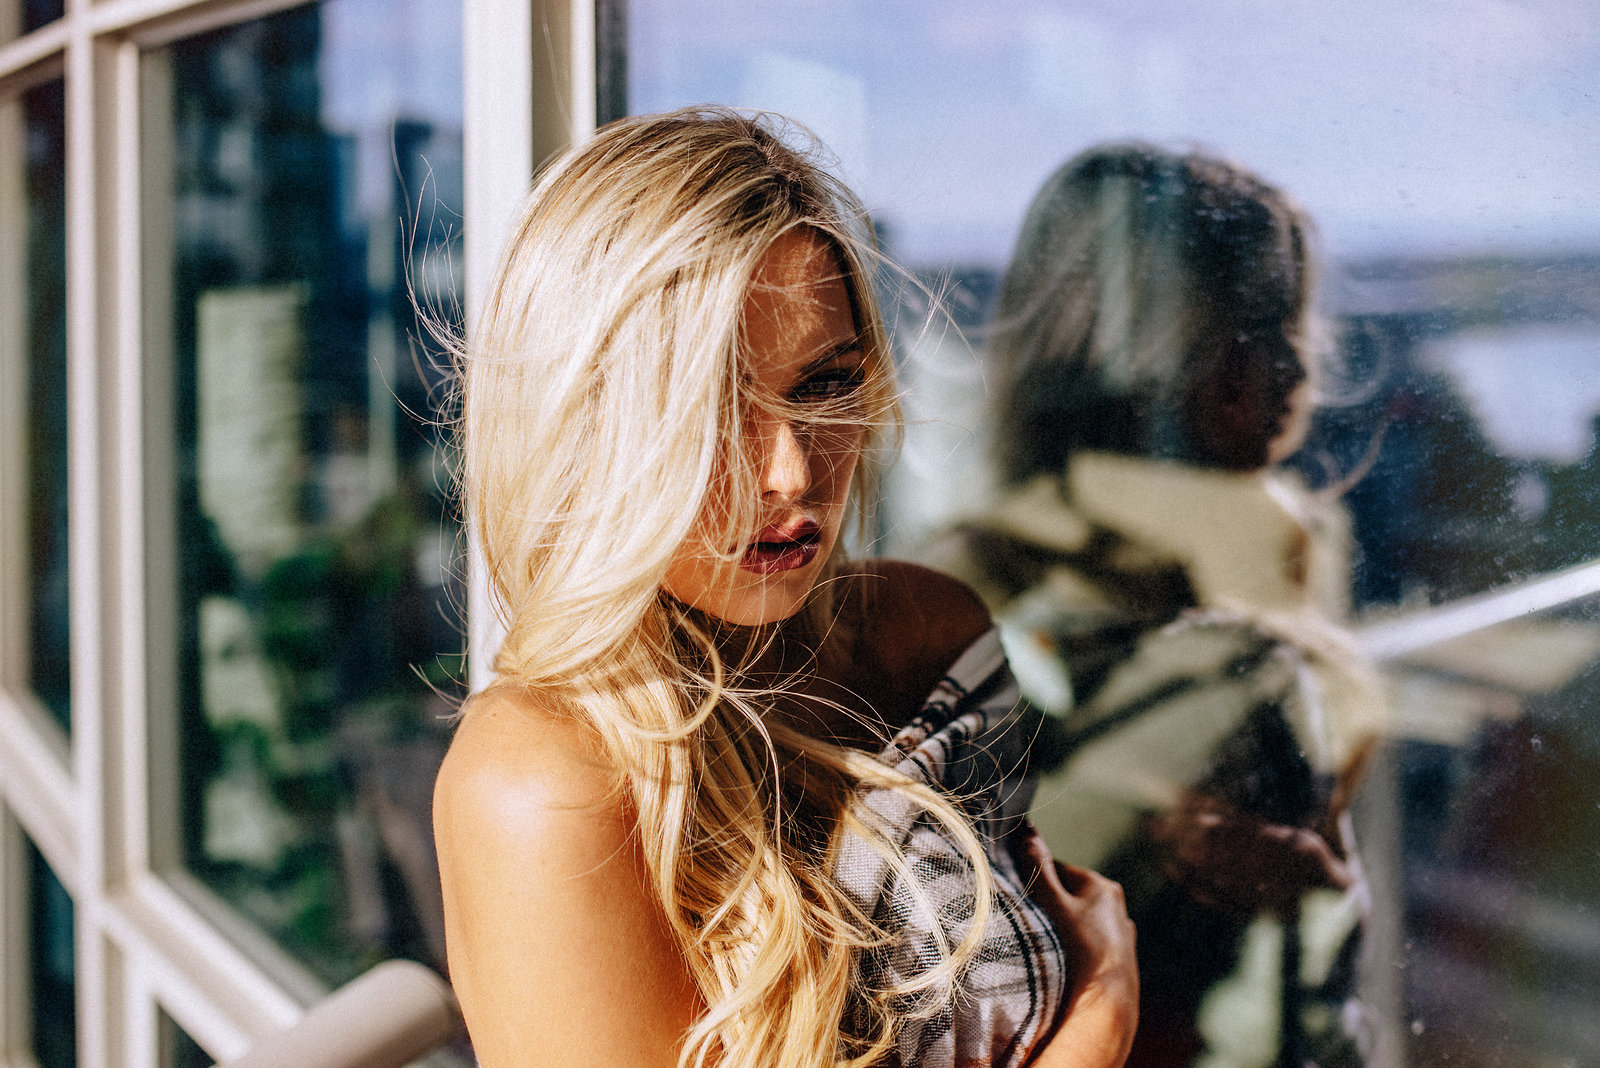 Cleavage Inge de Bruijn naked (44 photos), Tits, Sideboobs, Instagram, lingerie 2019